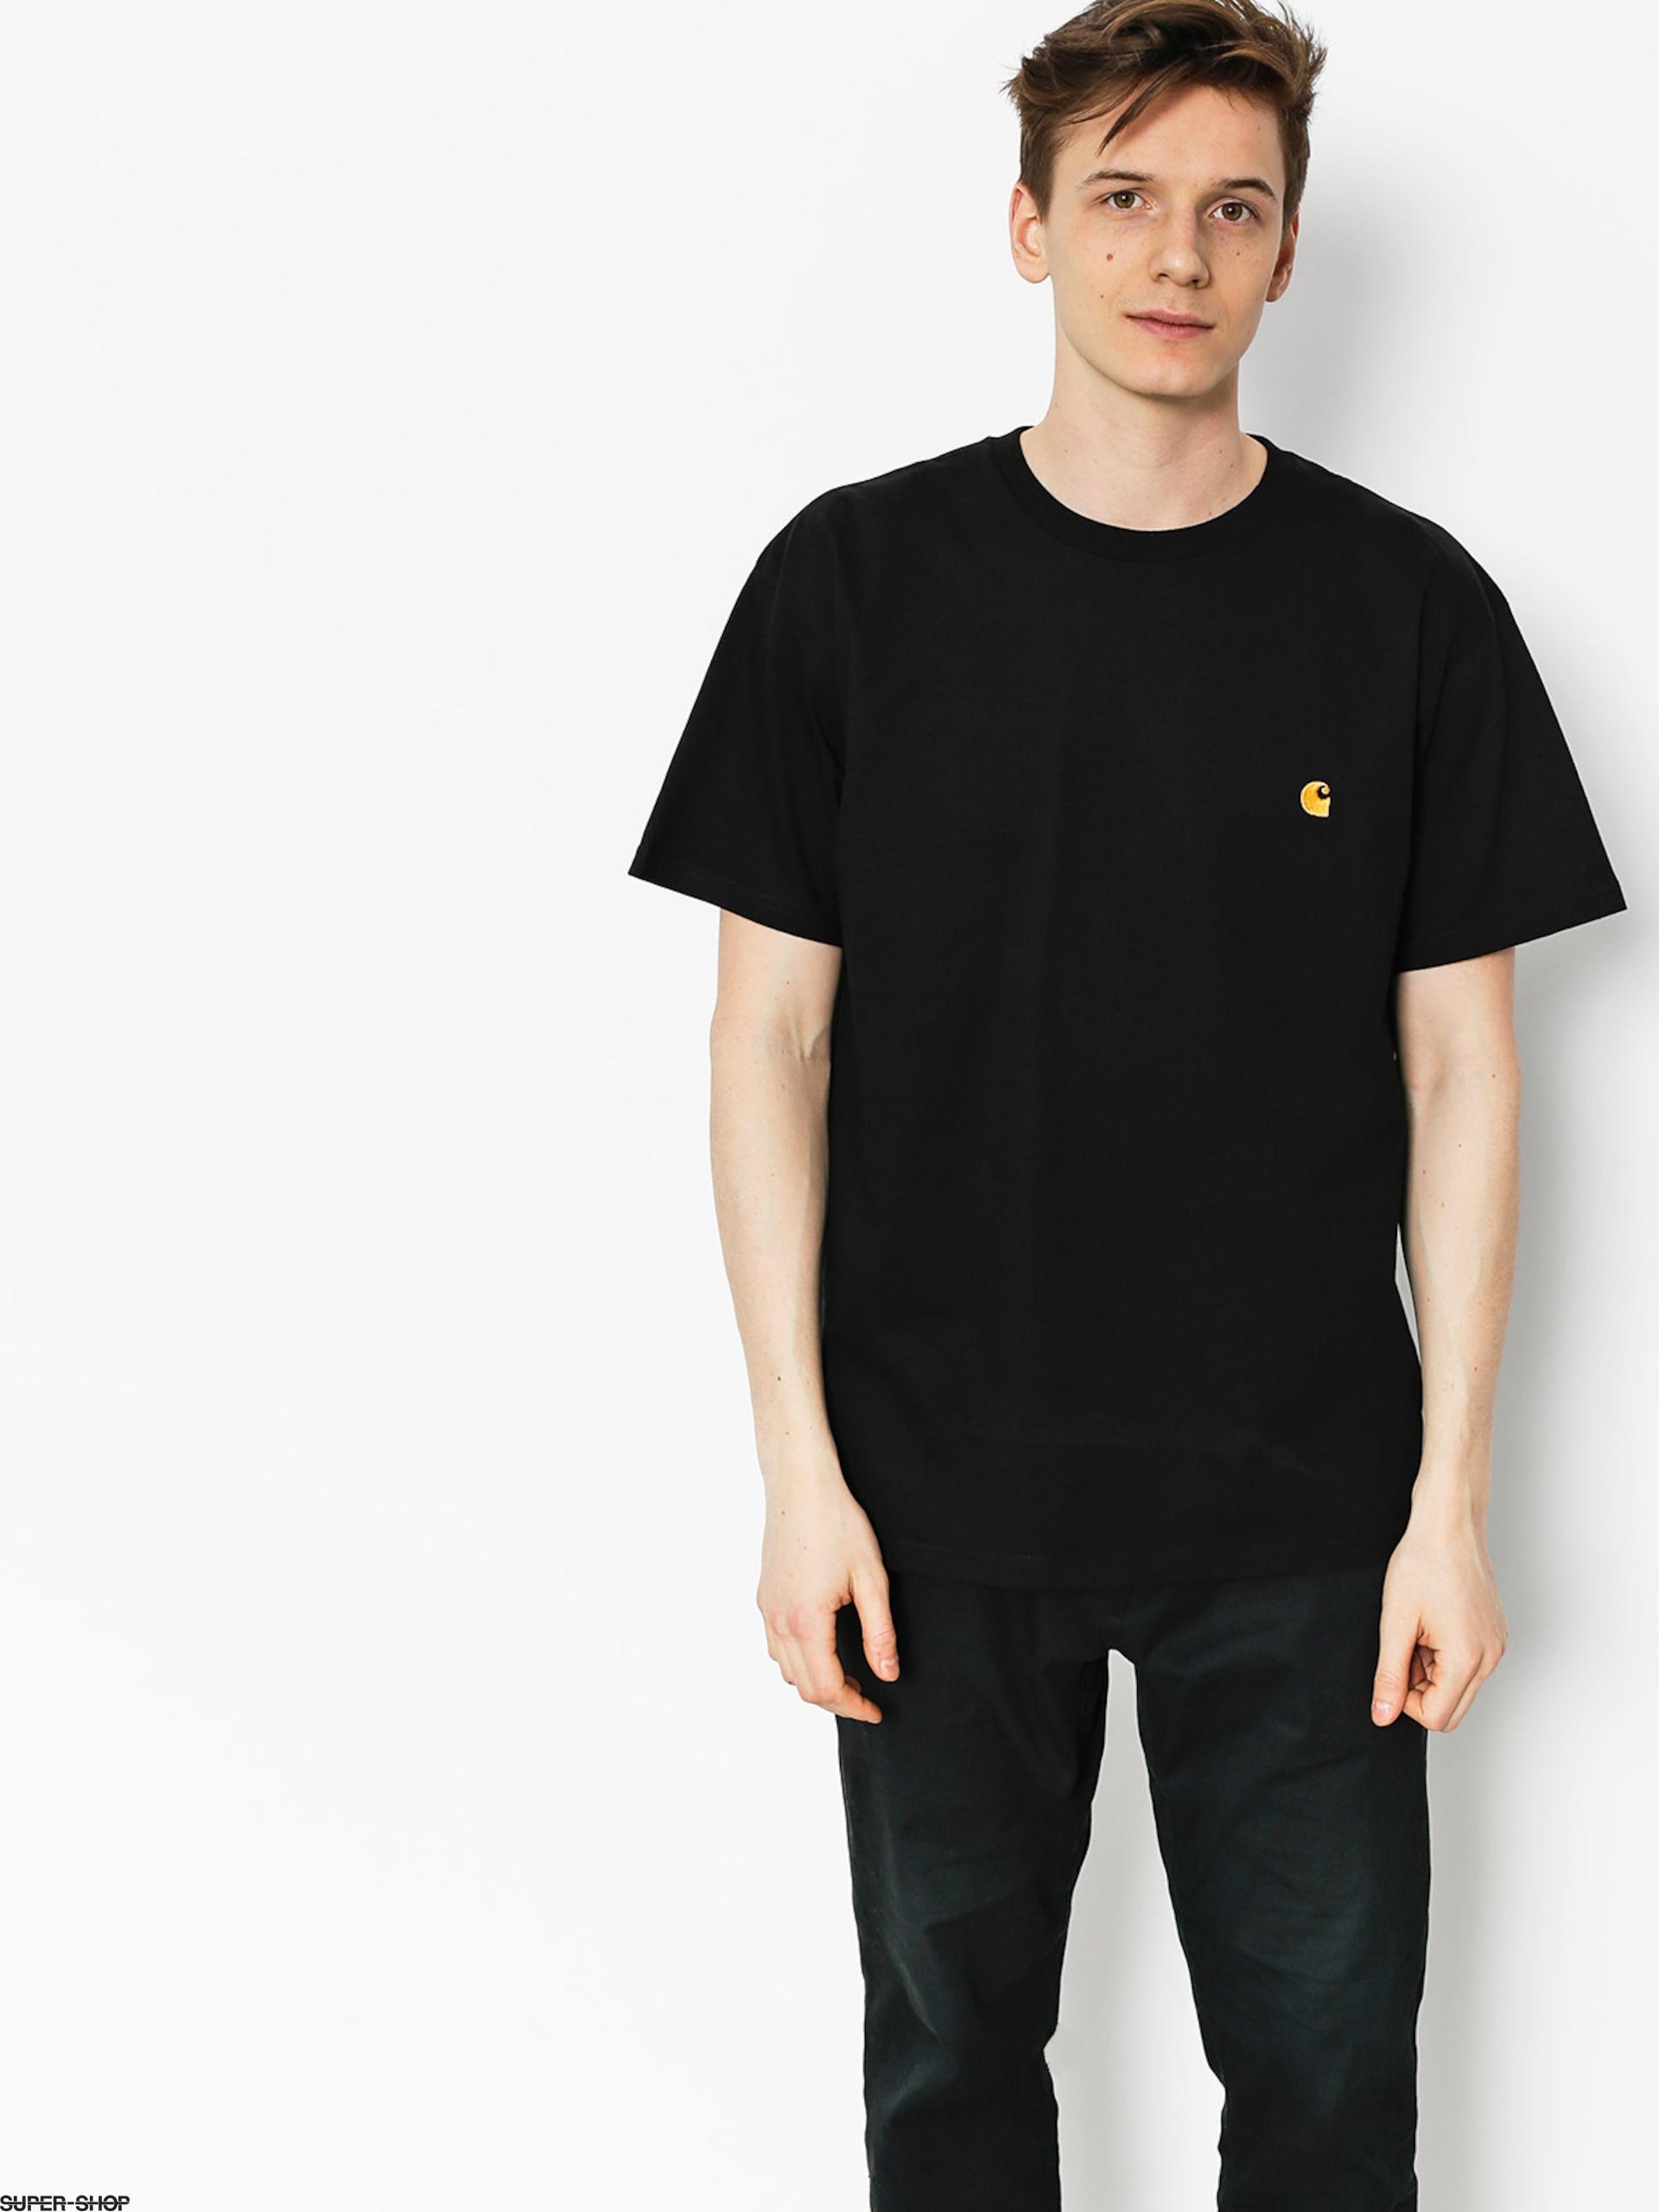 68f9a8d2 916794-w1920-carhartt-tshirt-chase-black-gold.jpg